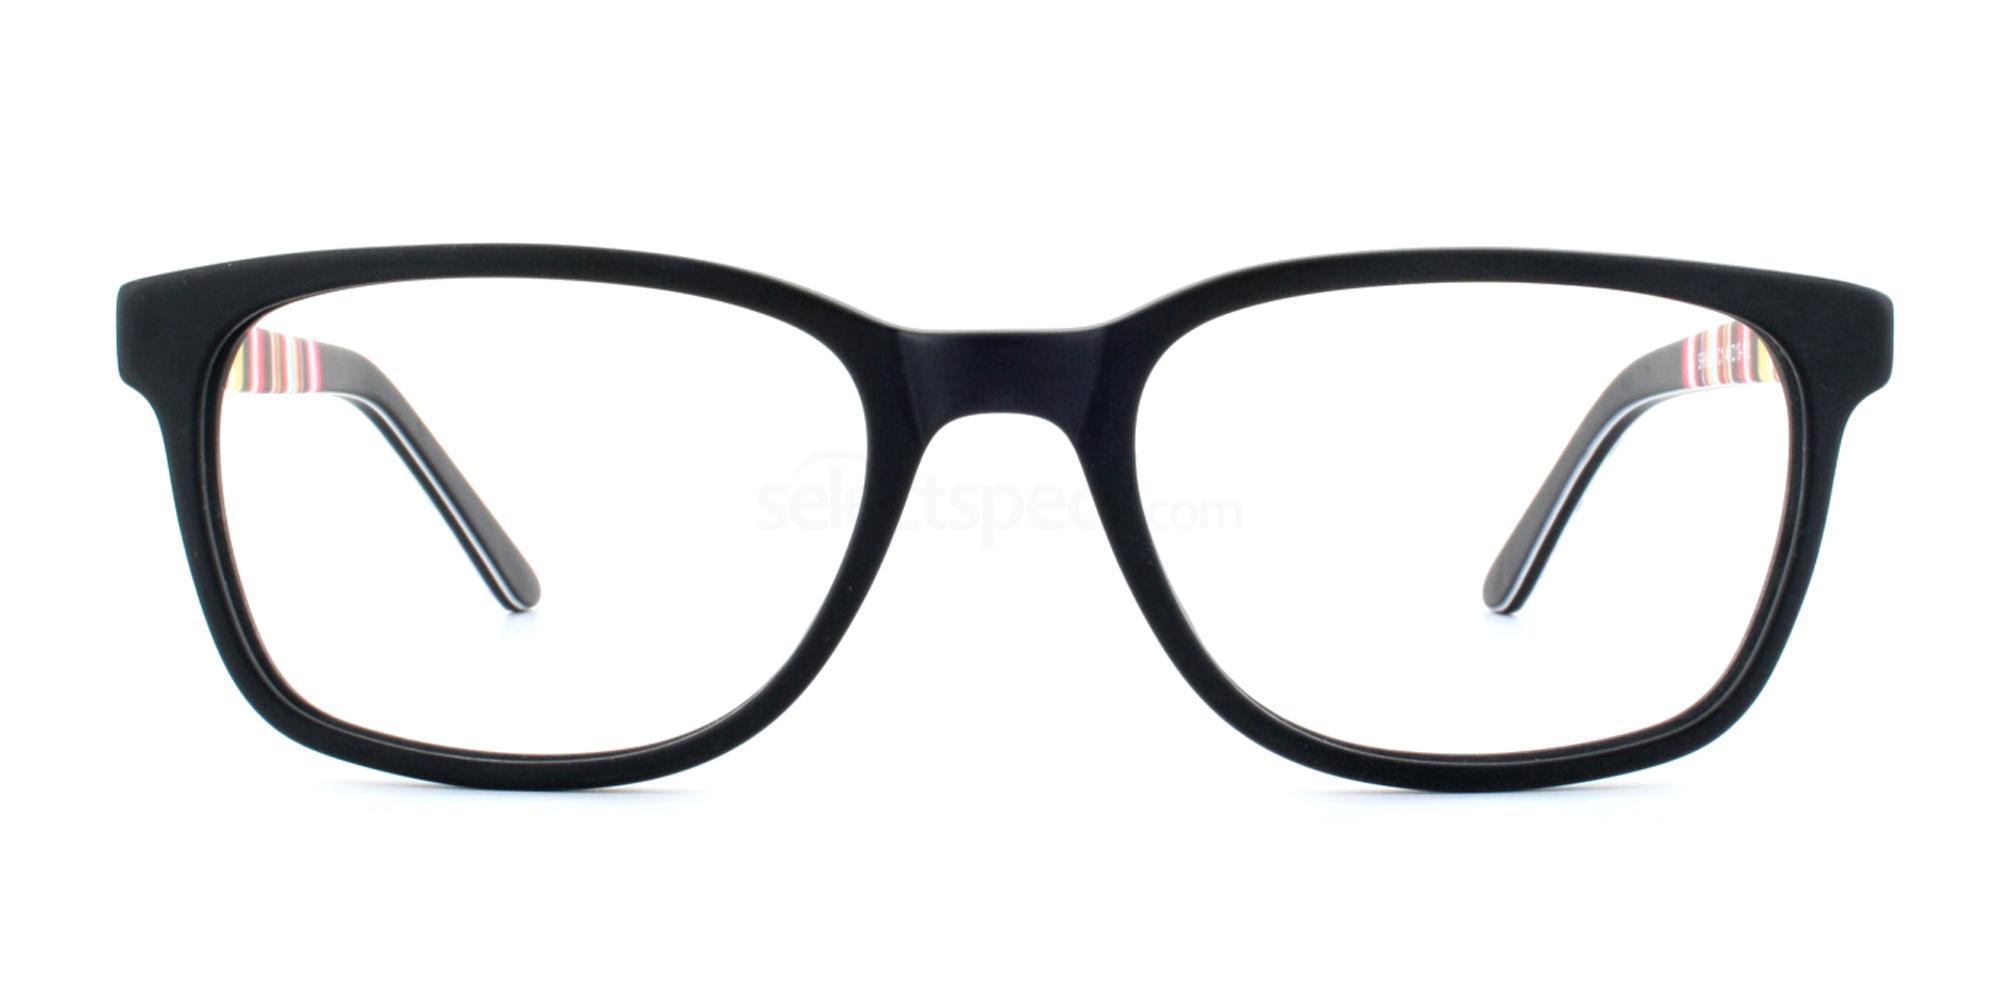 C1 SRK008 Glasses, SelectSpecs